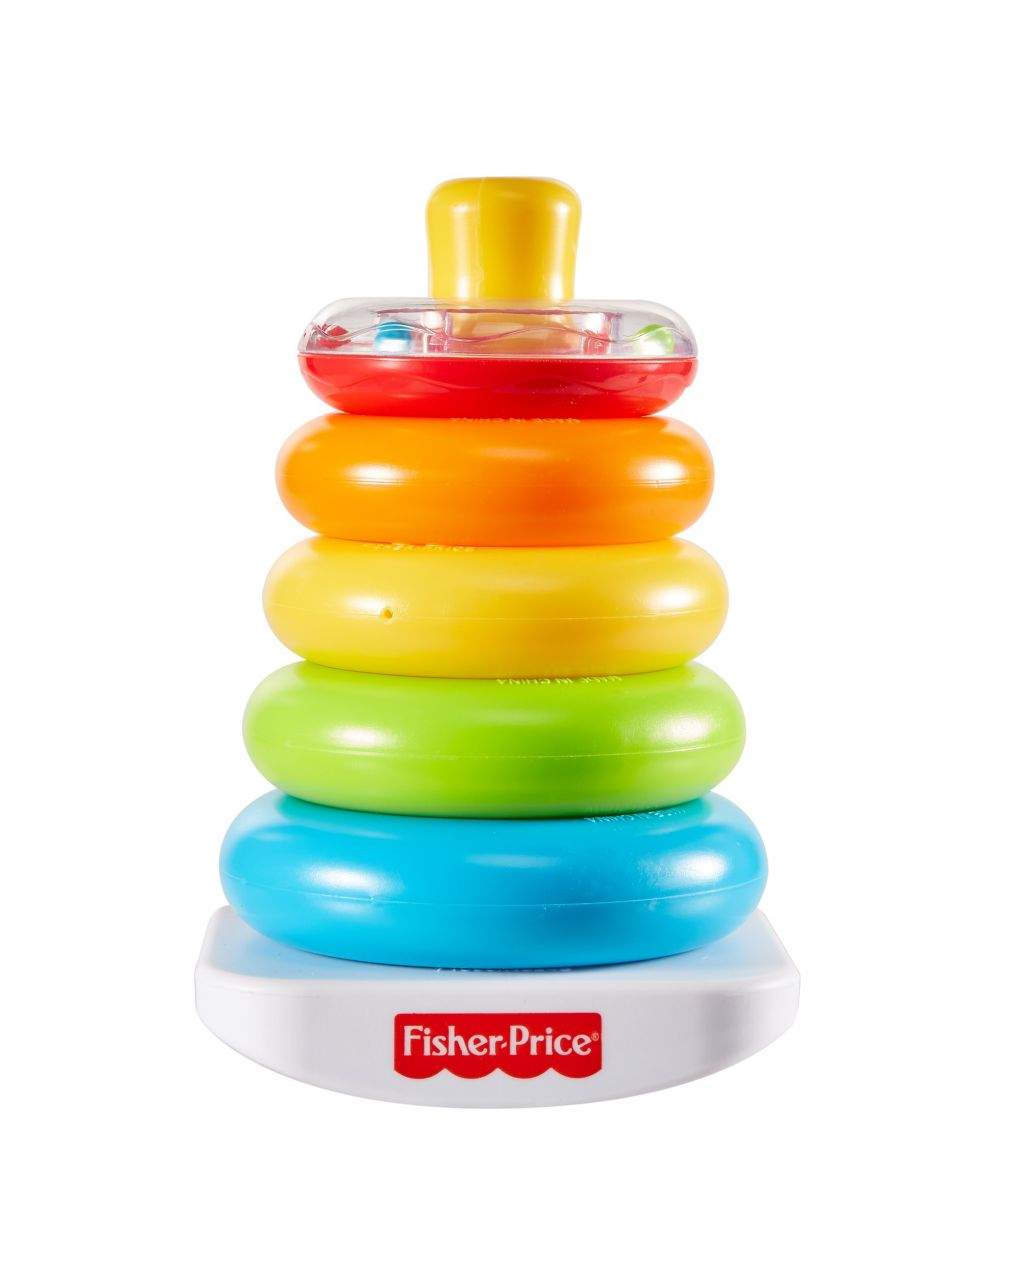 Fisher price - piramide 5 anelli - Fisher-Price